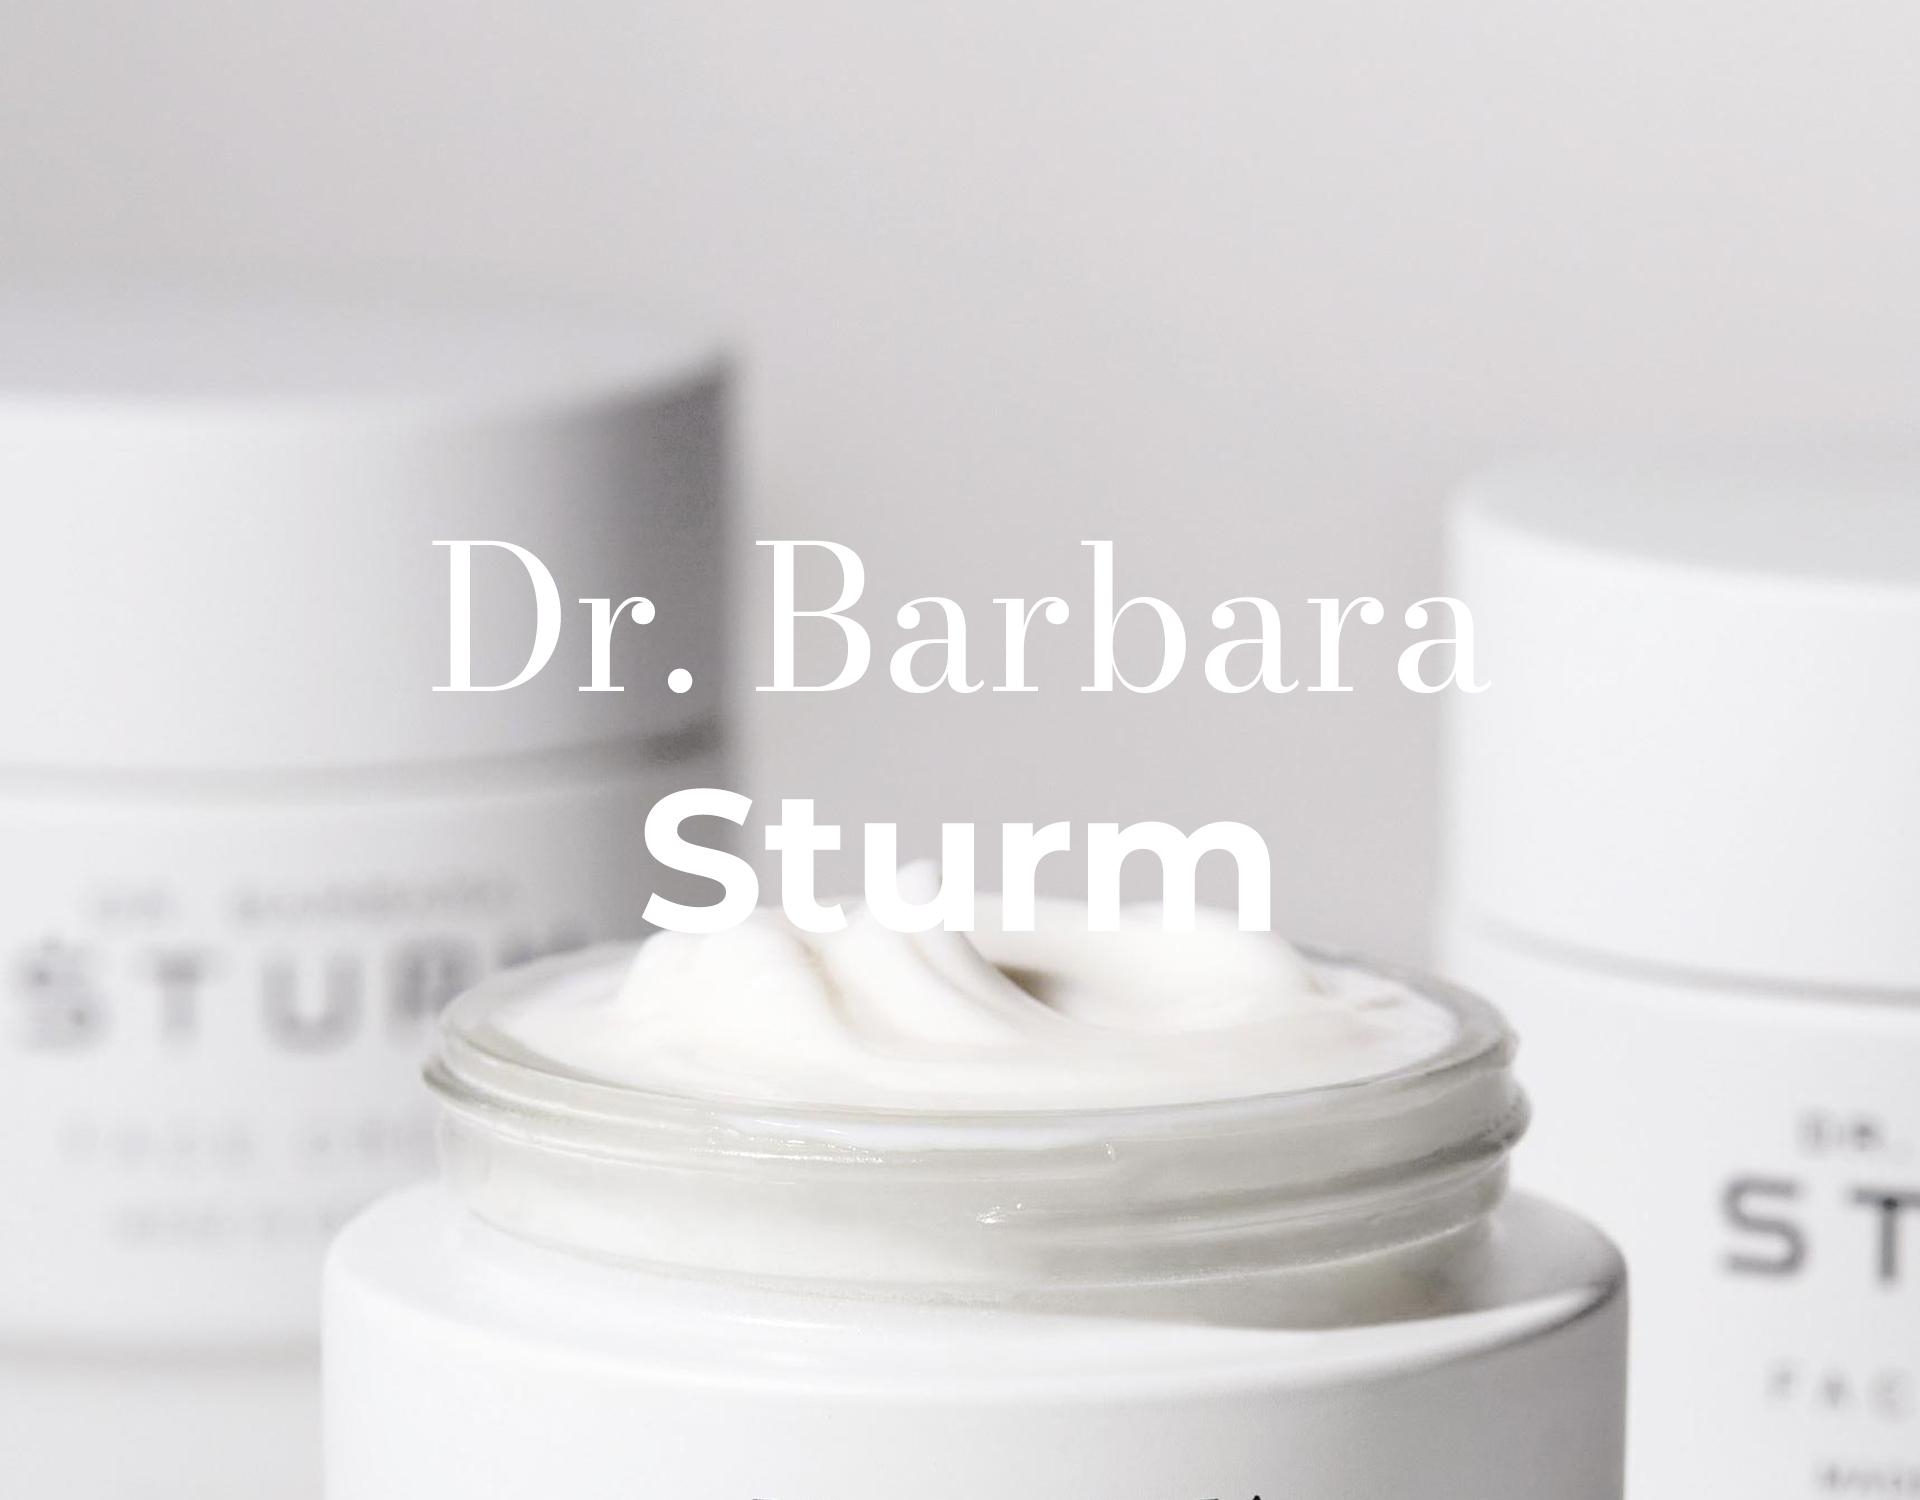 Dr. Barbara Sturm Creme